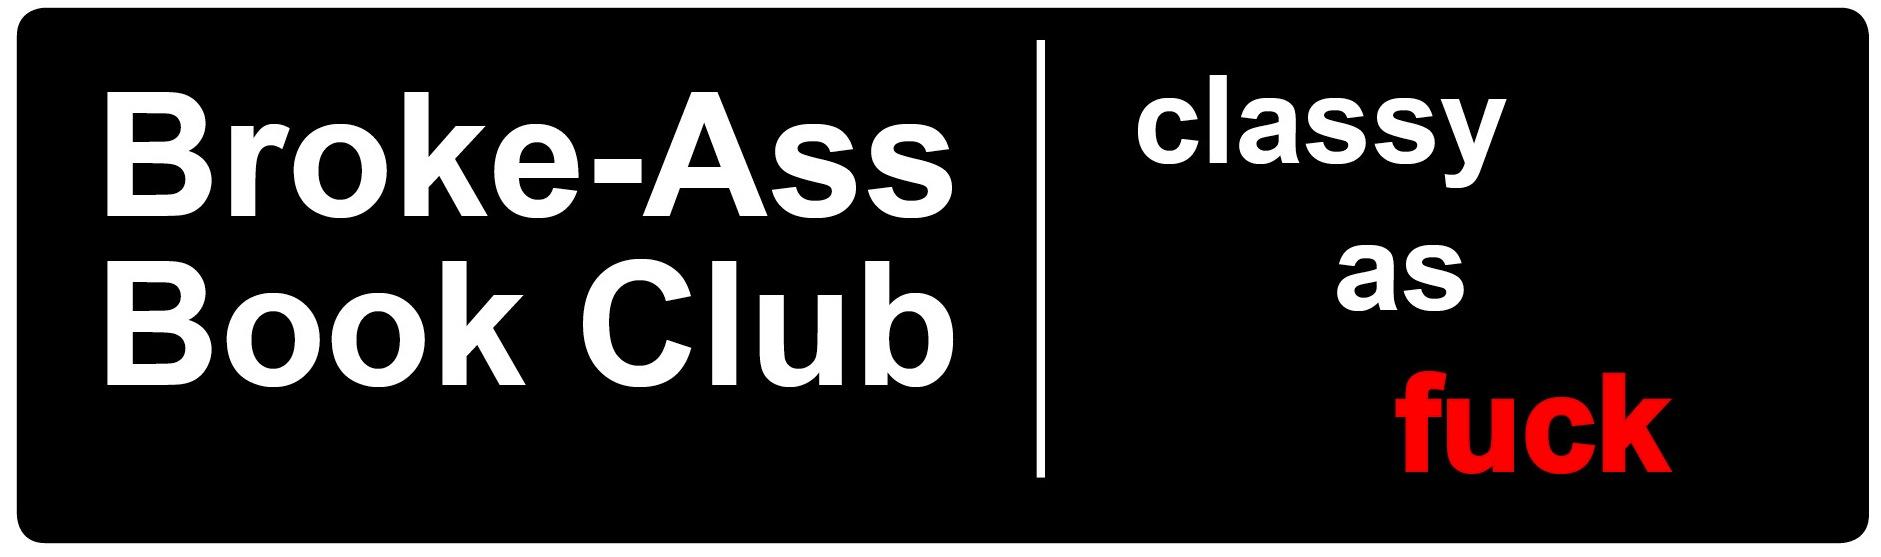 broke-ass-book-club-classy-as-fuck